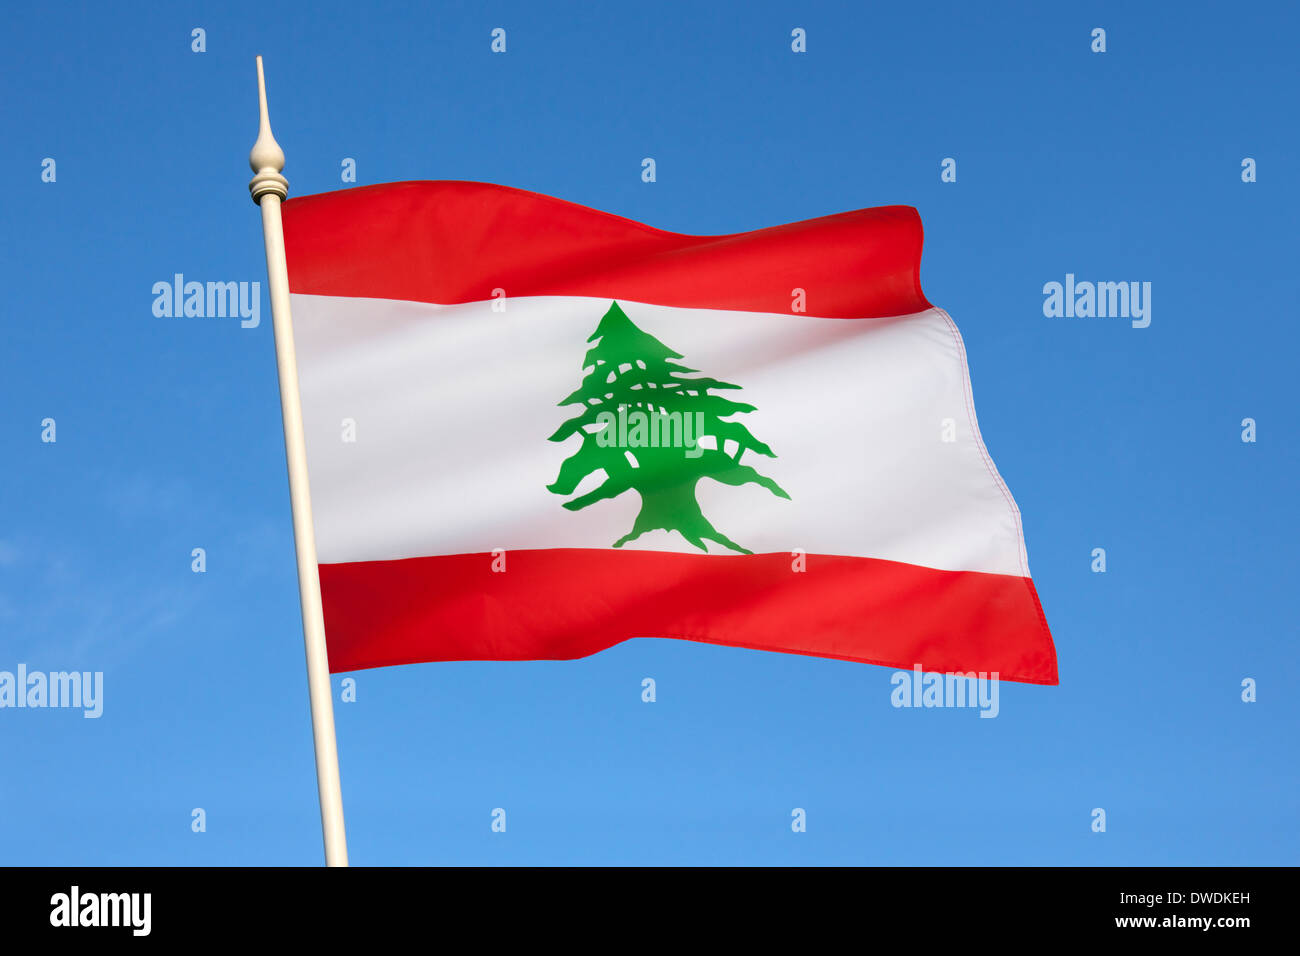 The flag of Lebanon - Stock Image